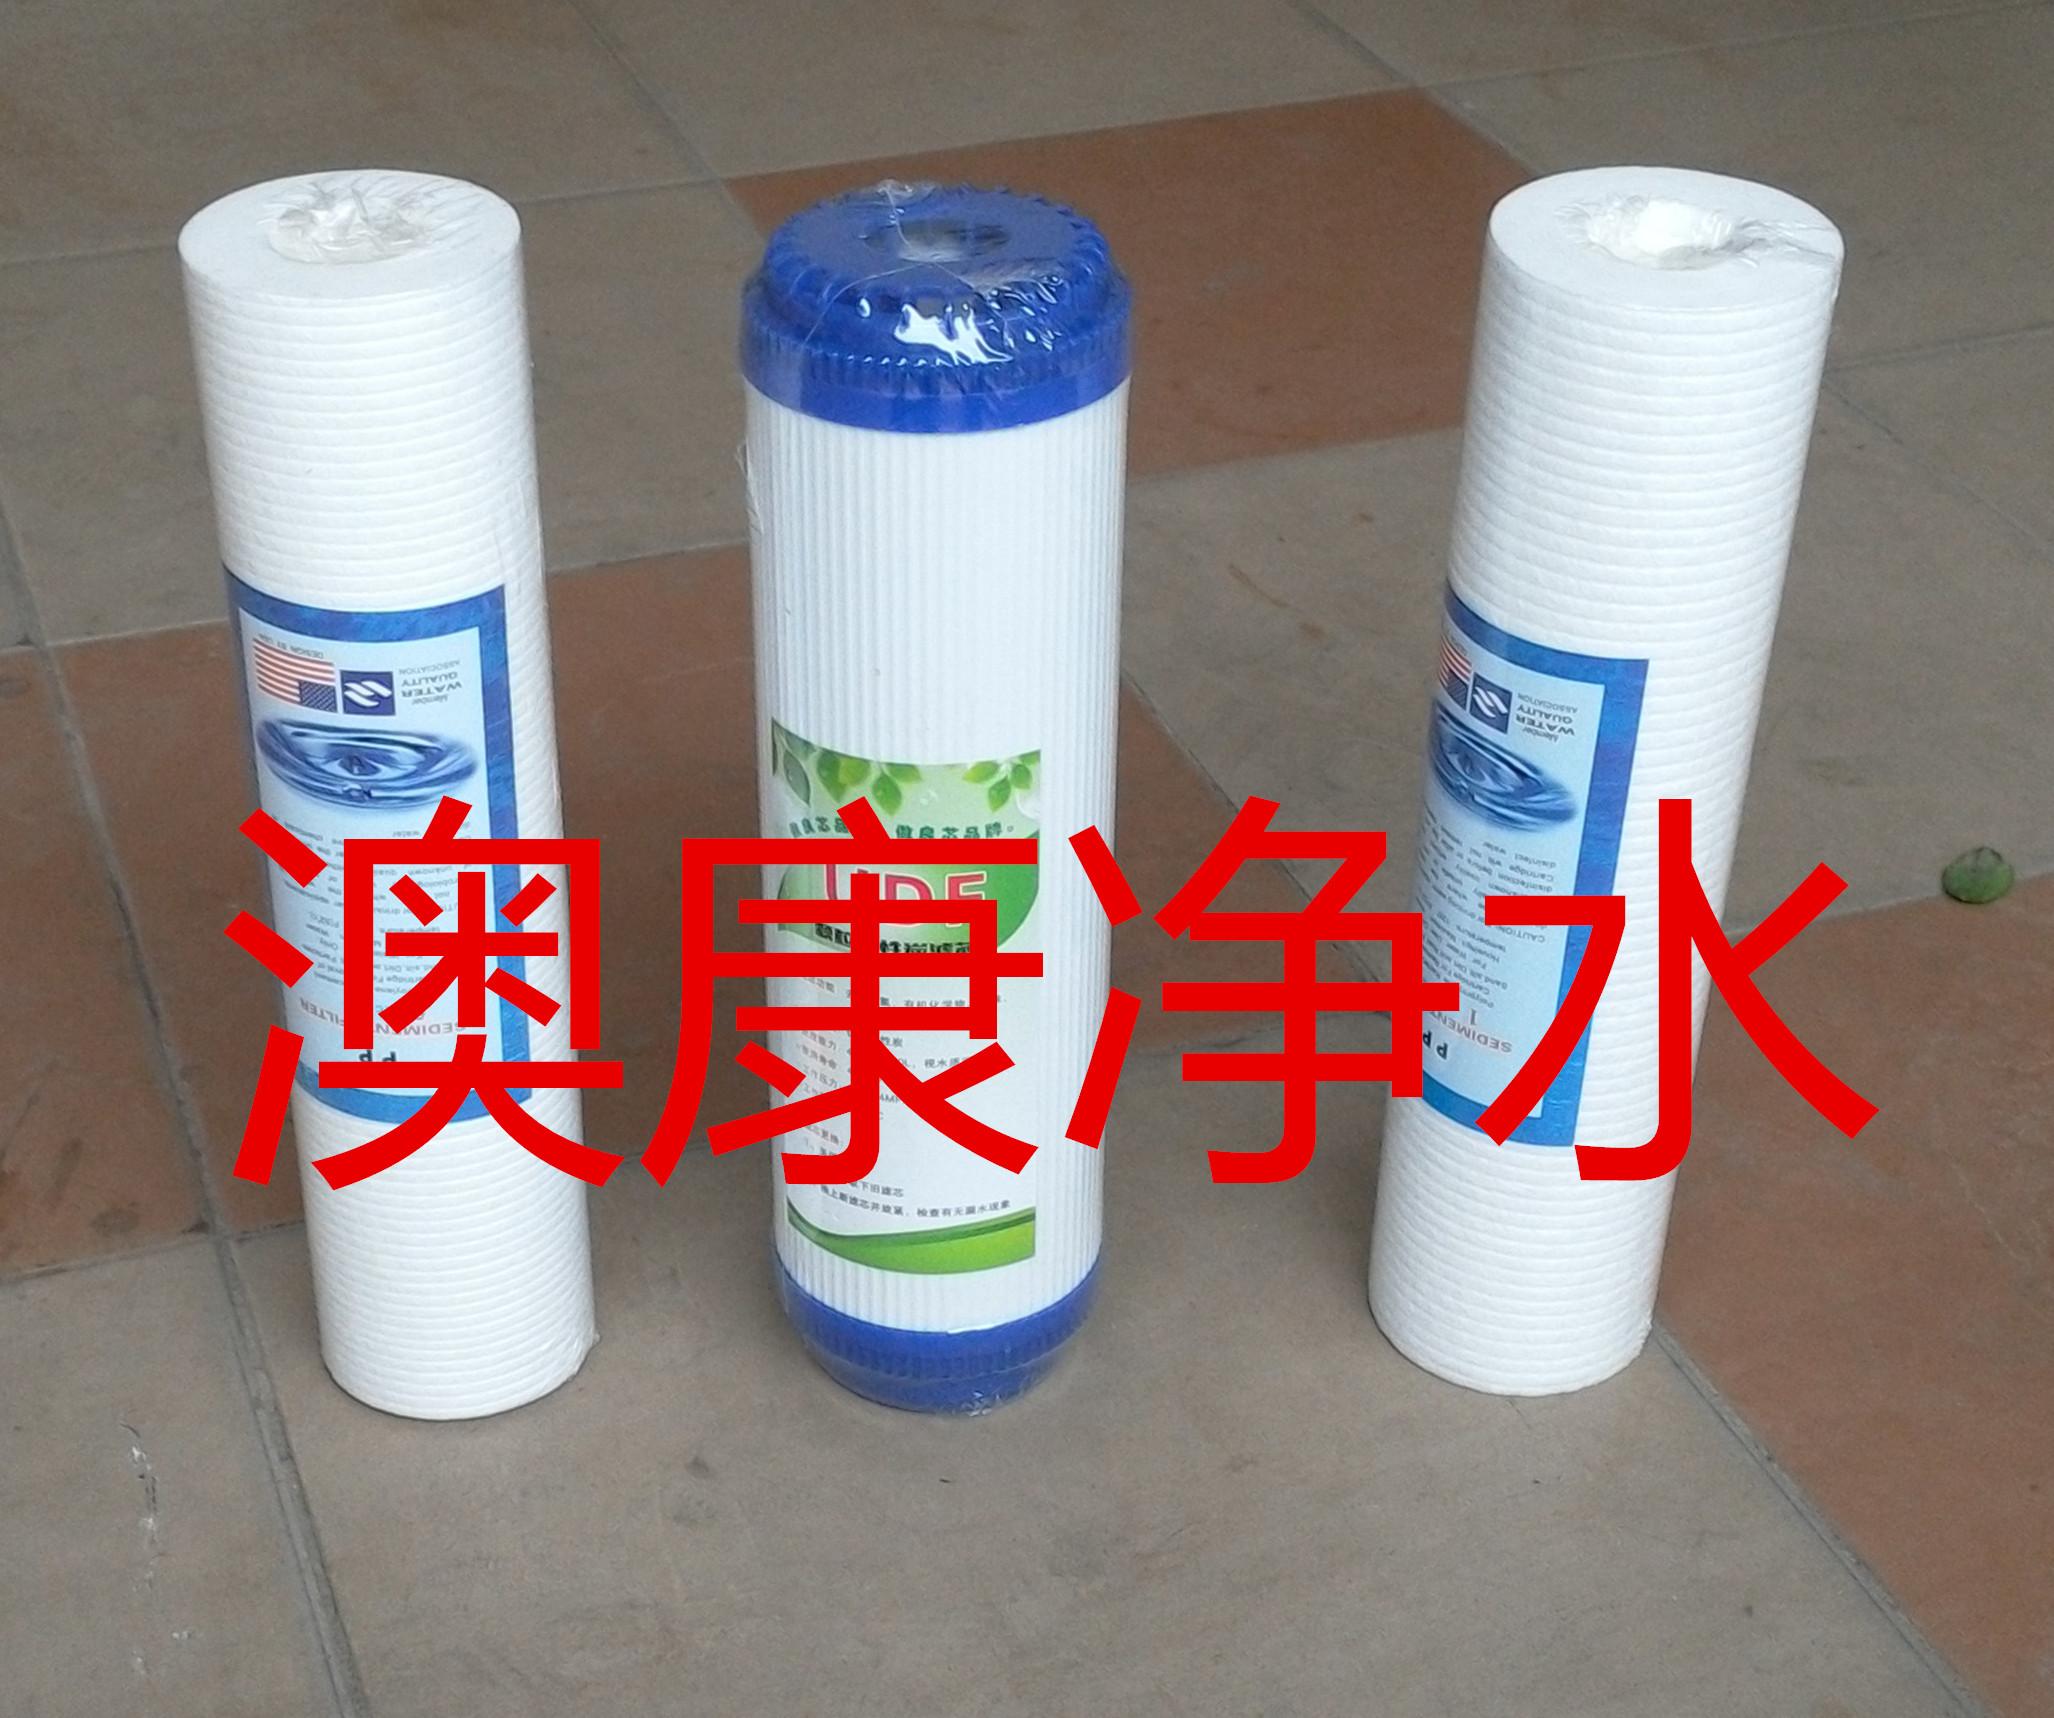 Verschüttete siyuan geschmack der Sonne Rand Yeo hiap Seng - wasserfilter aus der umkehrosmose - Universal - 12345.